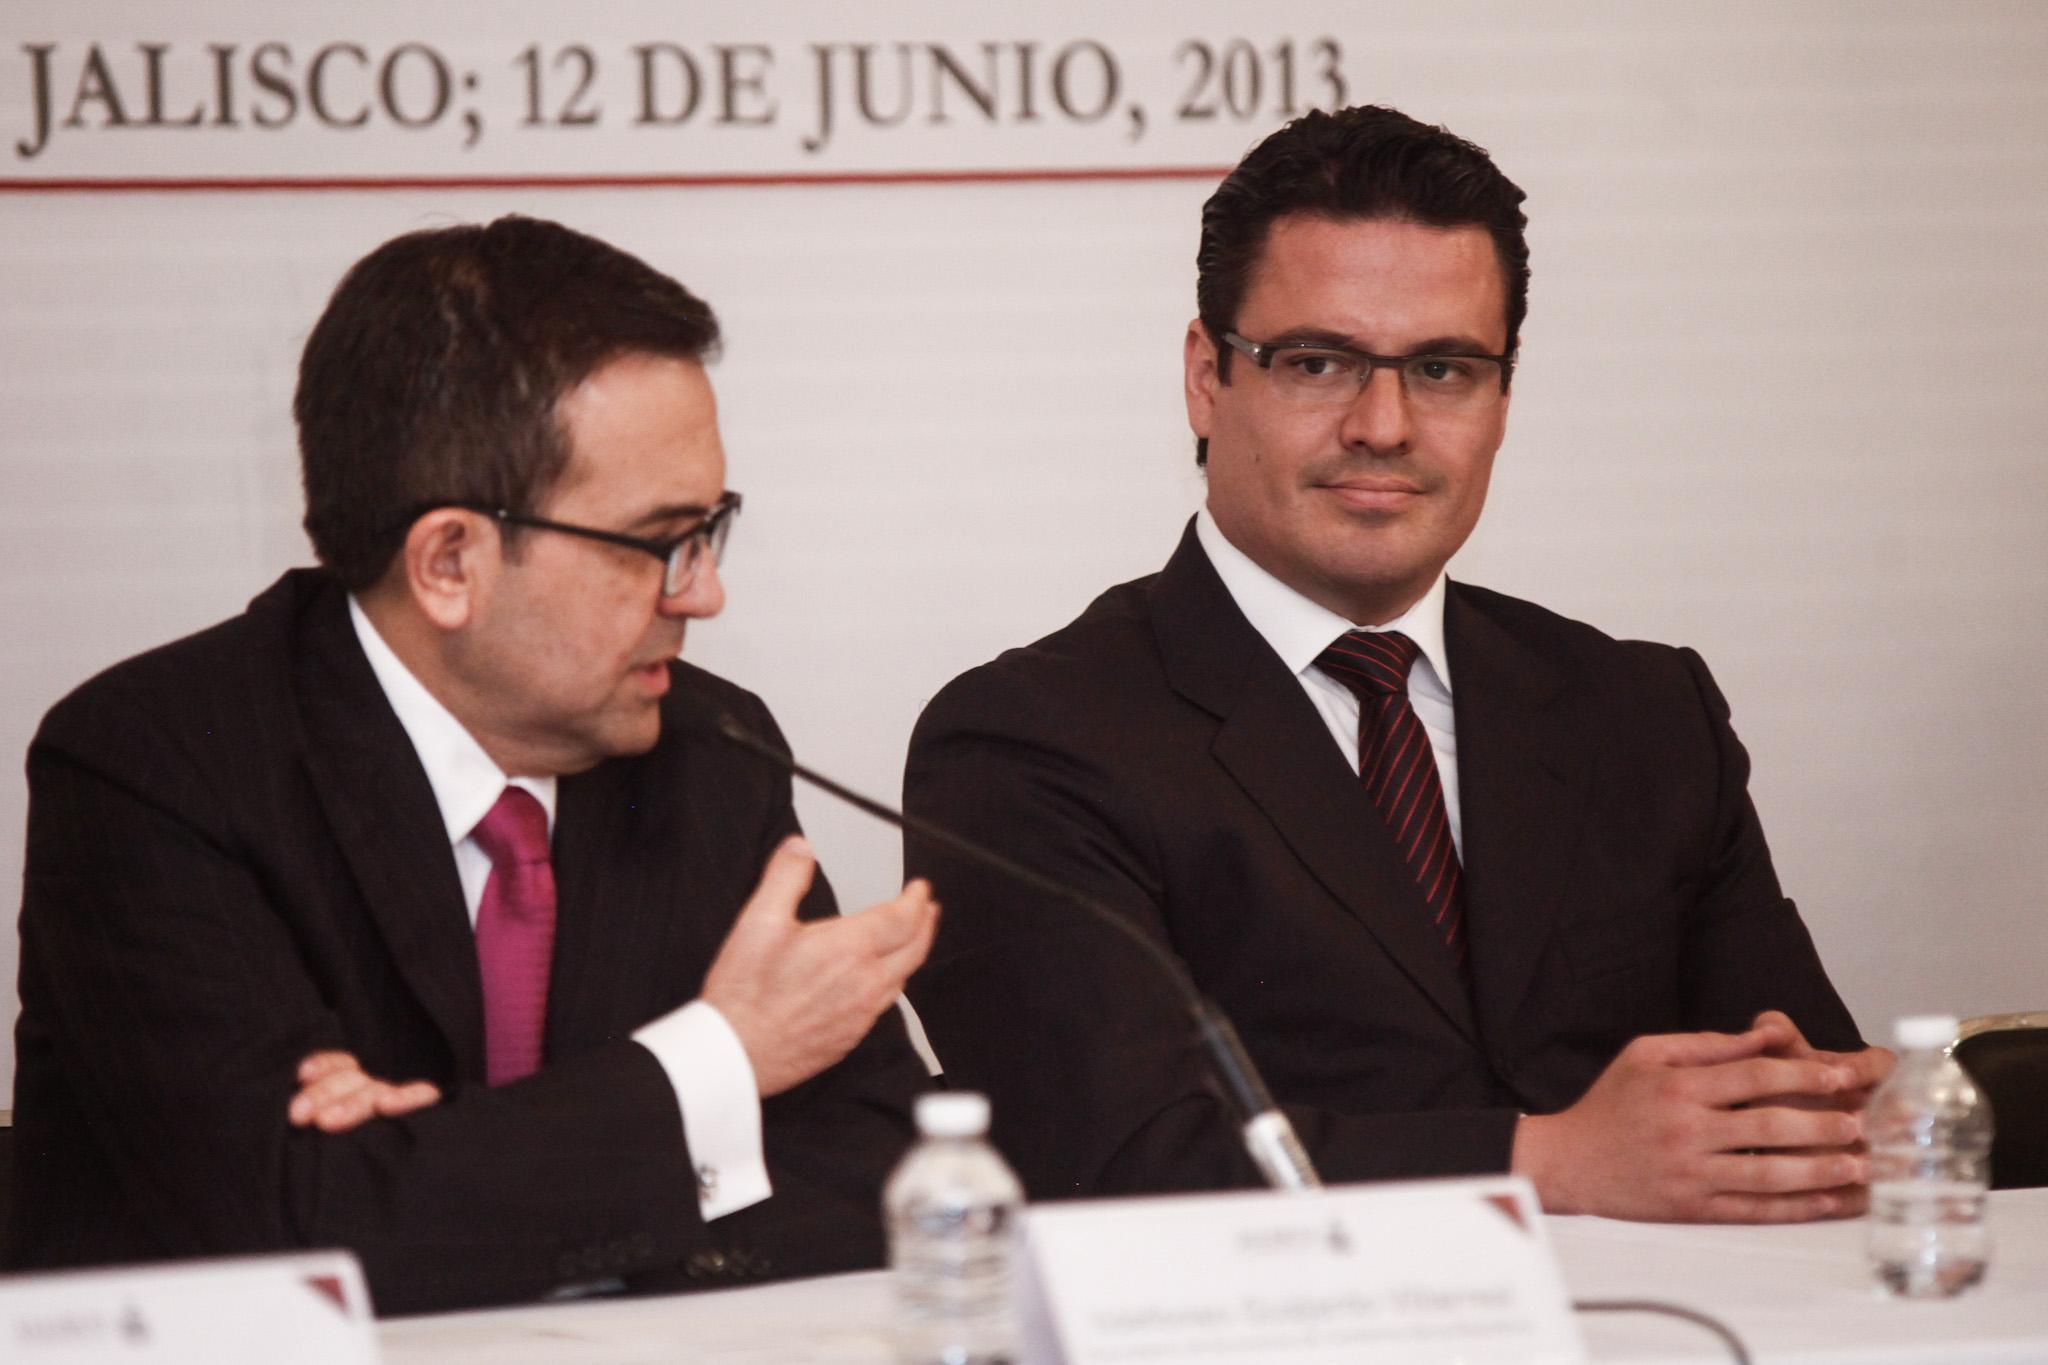 Firman convenio en materia de mejora regulatoria